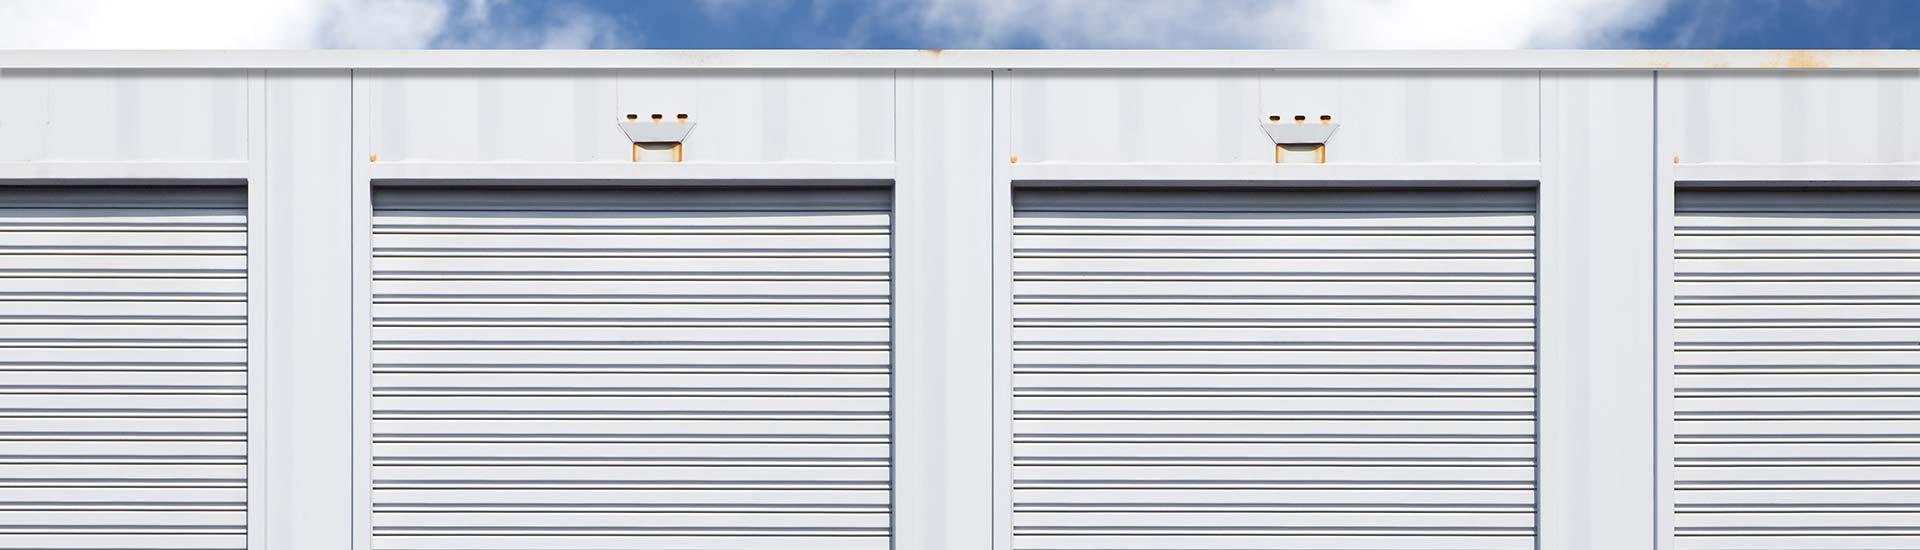 Storage Units in Missoula MT  sc 1 st  Sherlock Storage & Storage Units for Rent in Missoula MT | RV u0026 Boat Storage